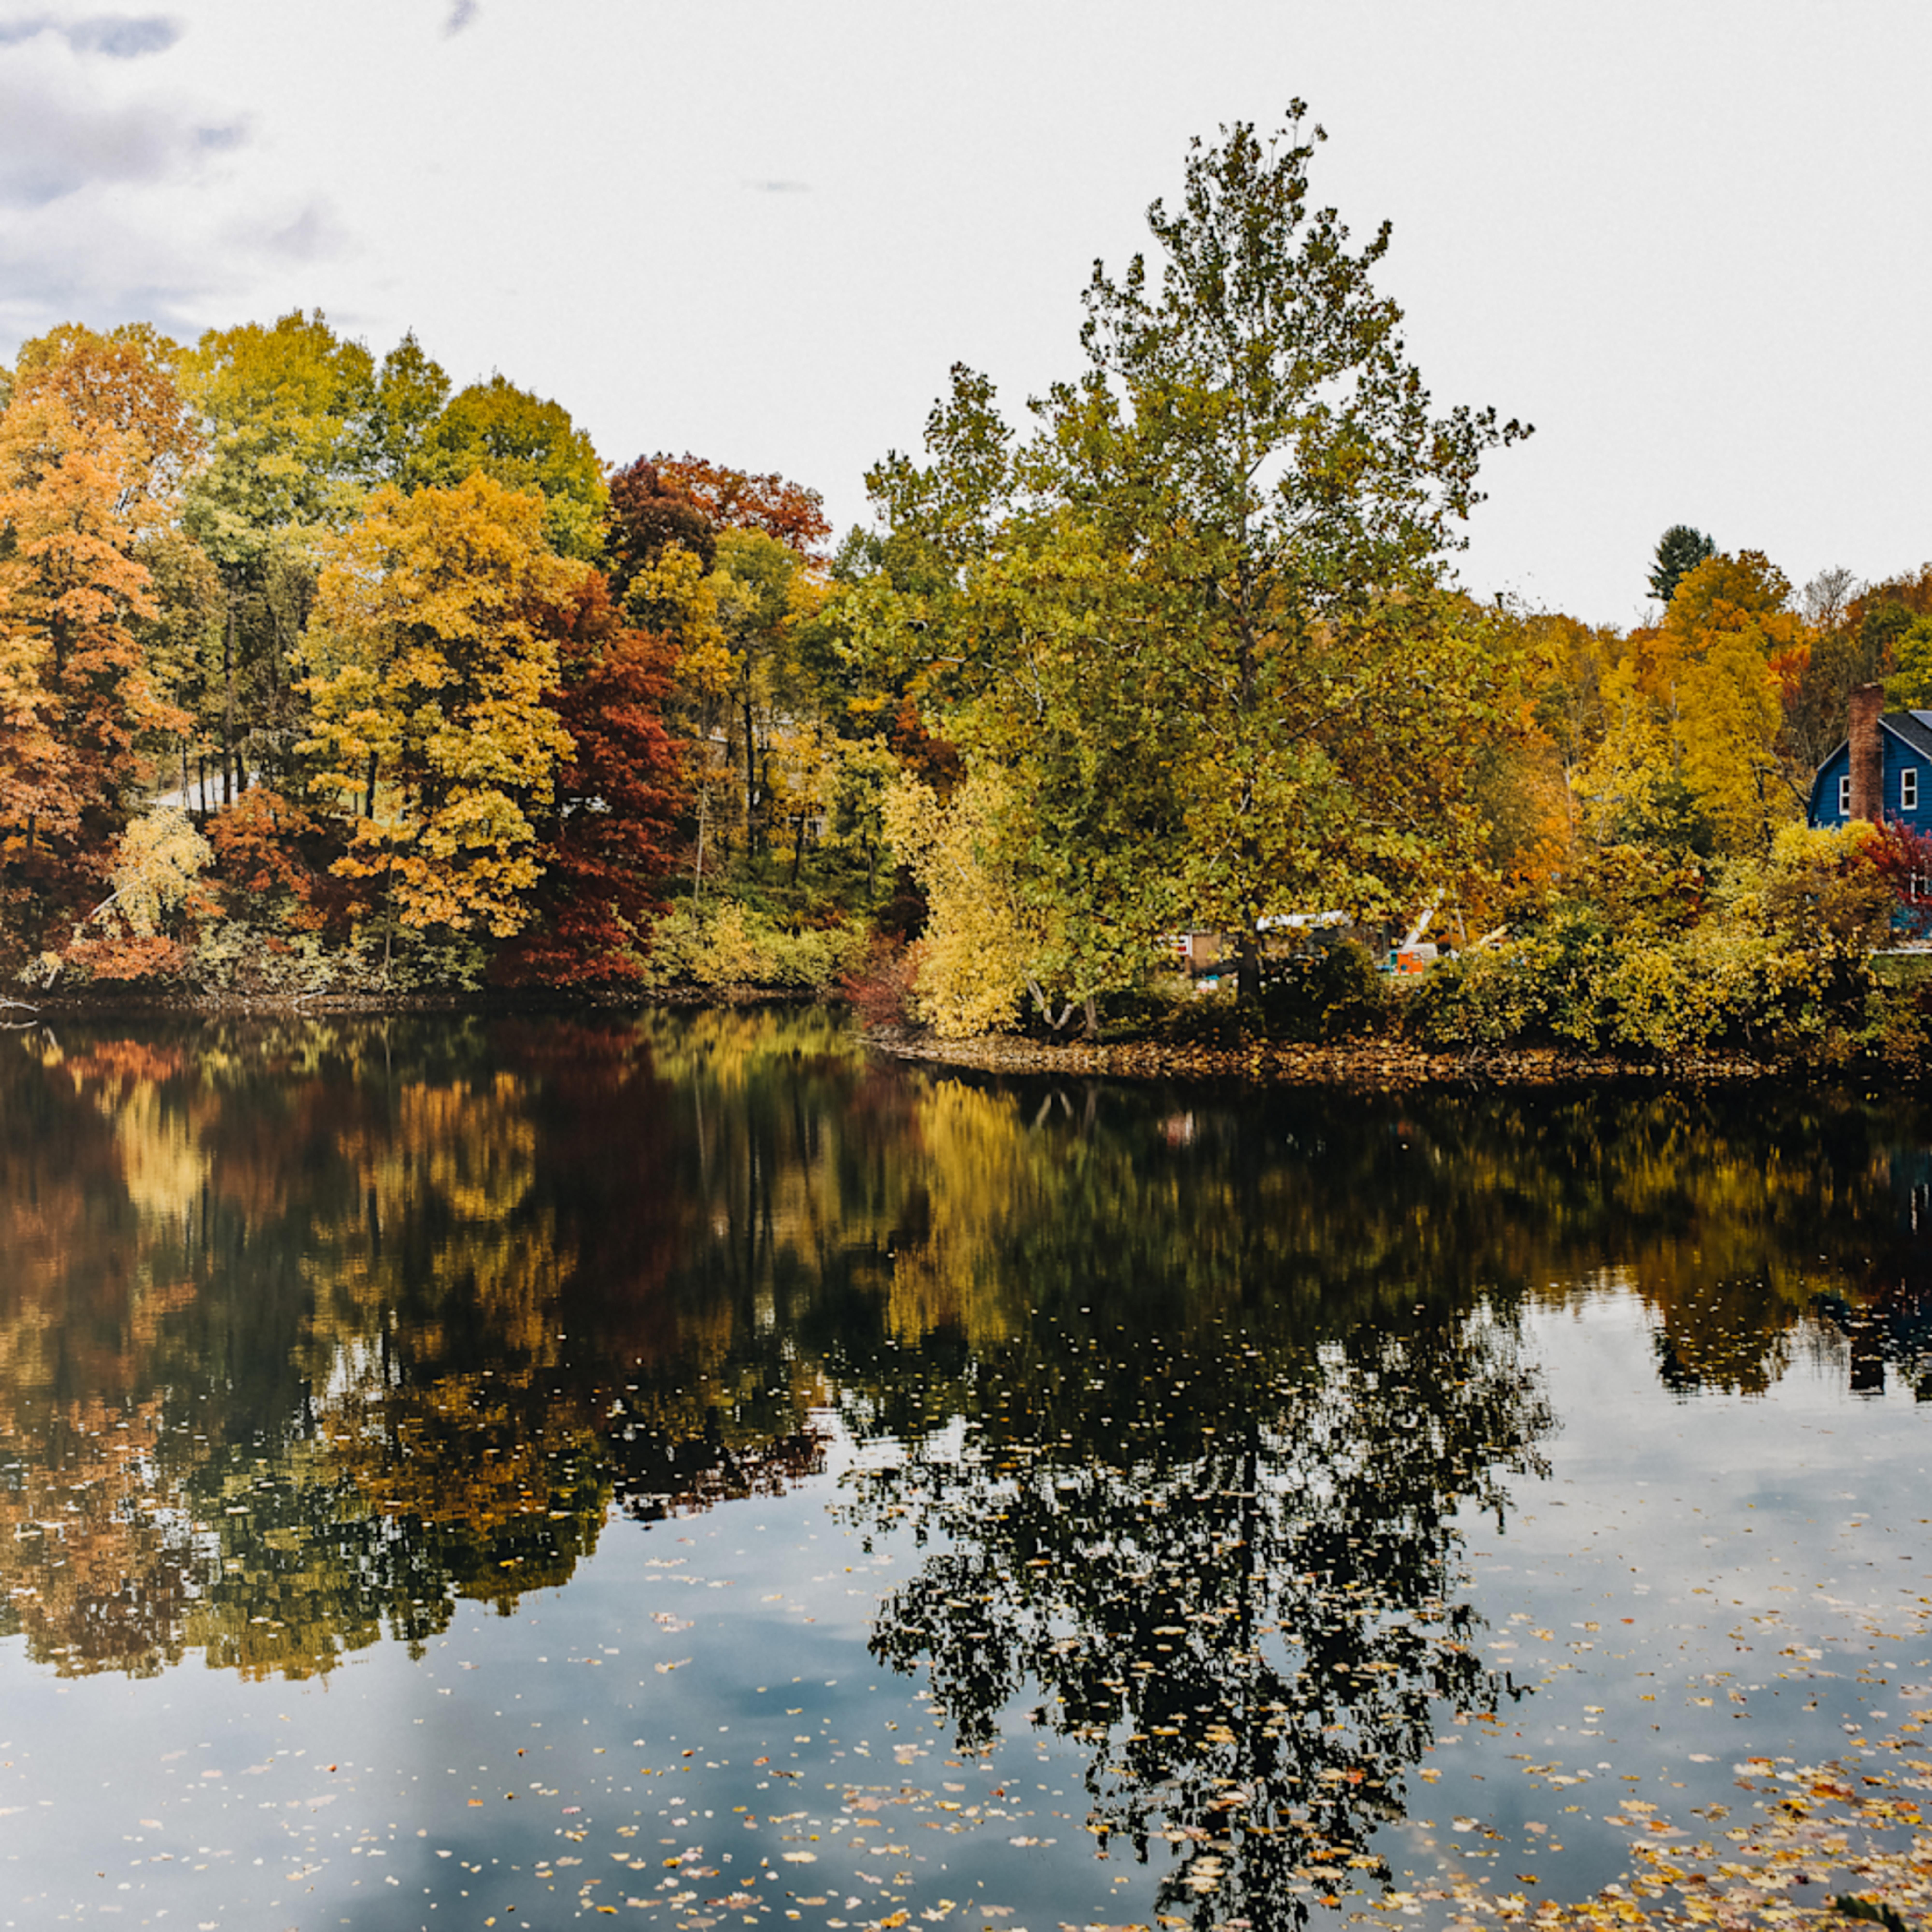 Golden pond ecqgll